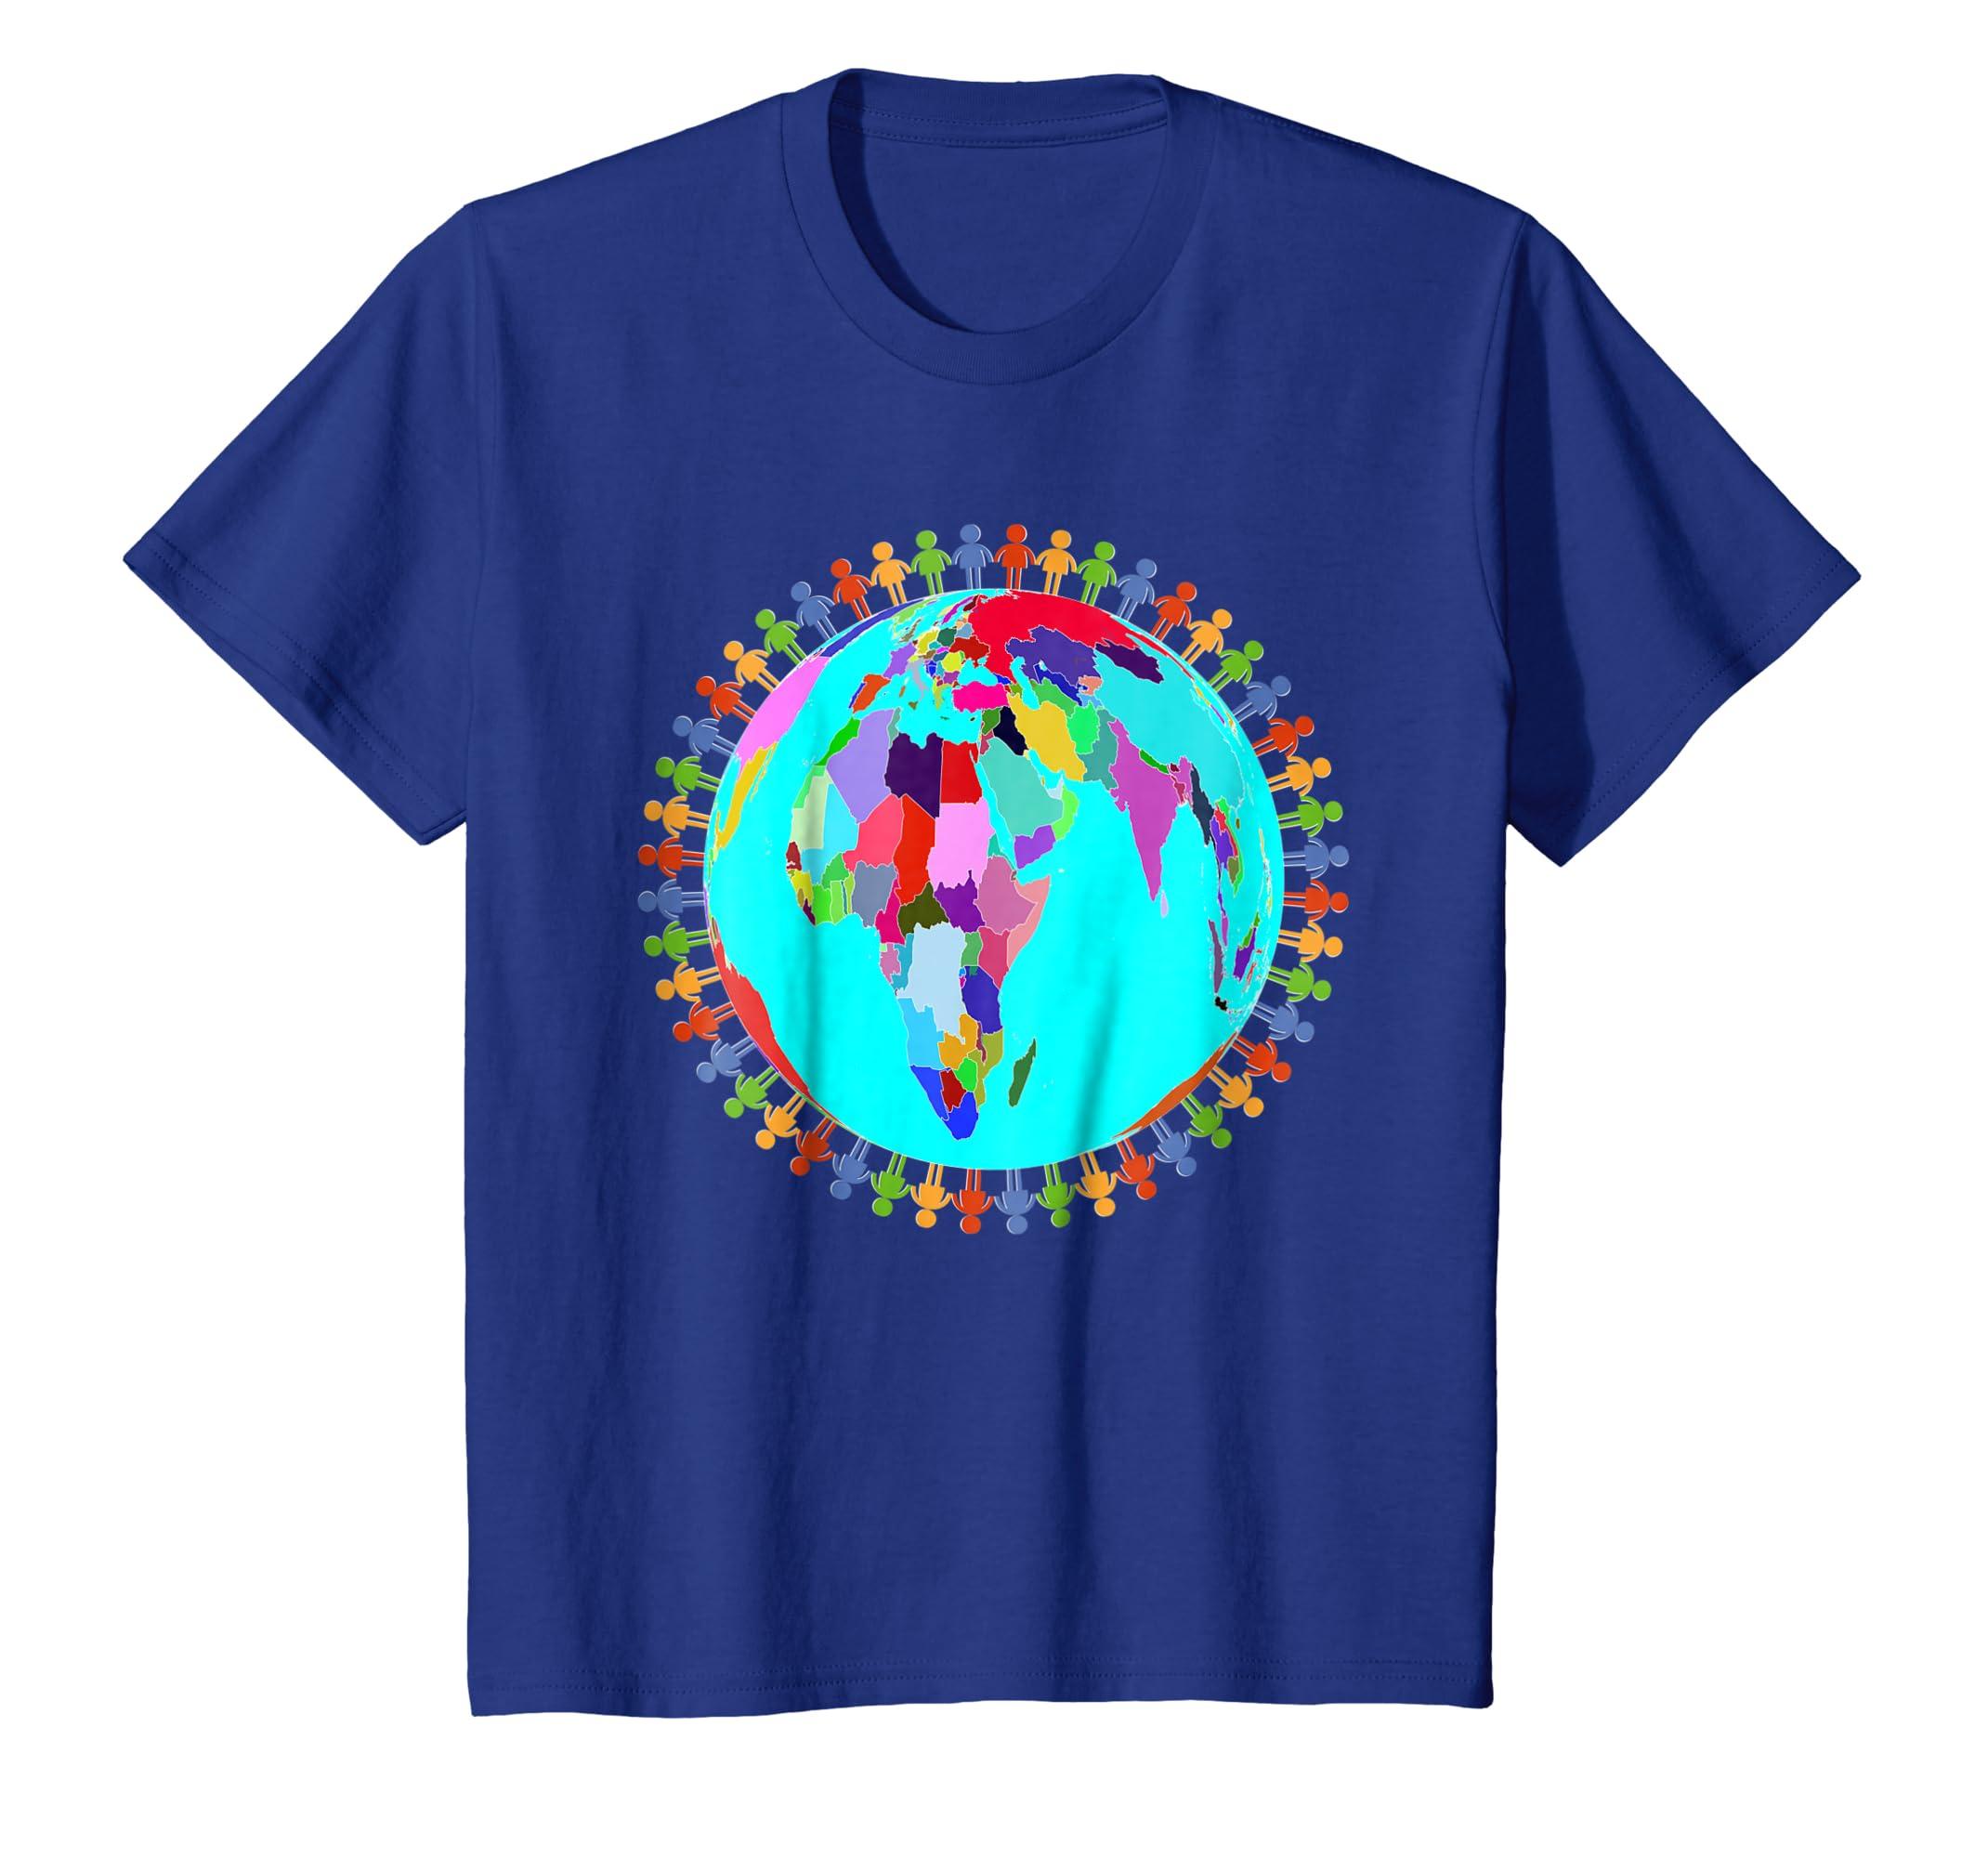 9cfc50ed0 Amazon.com: World Globe Planet People Humans Funny Earth Day T-Shirt:  Clothing